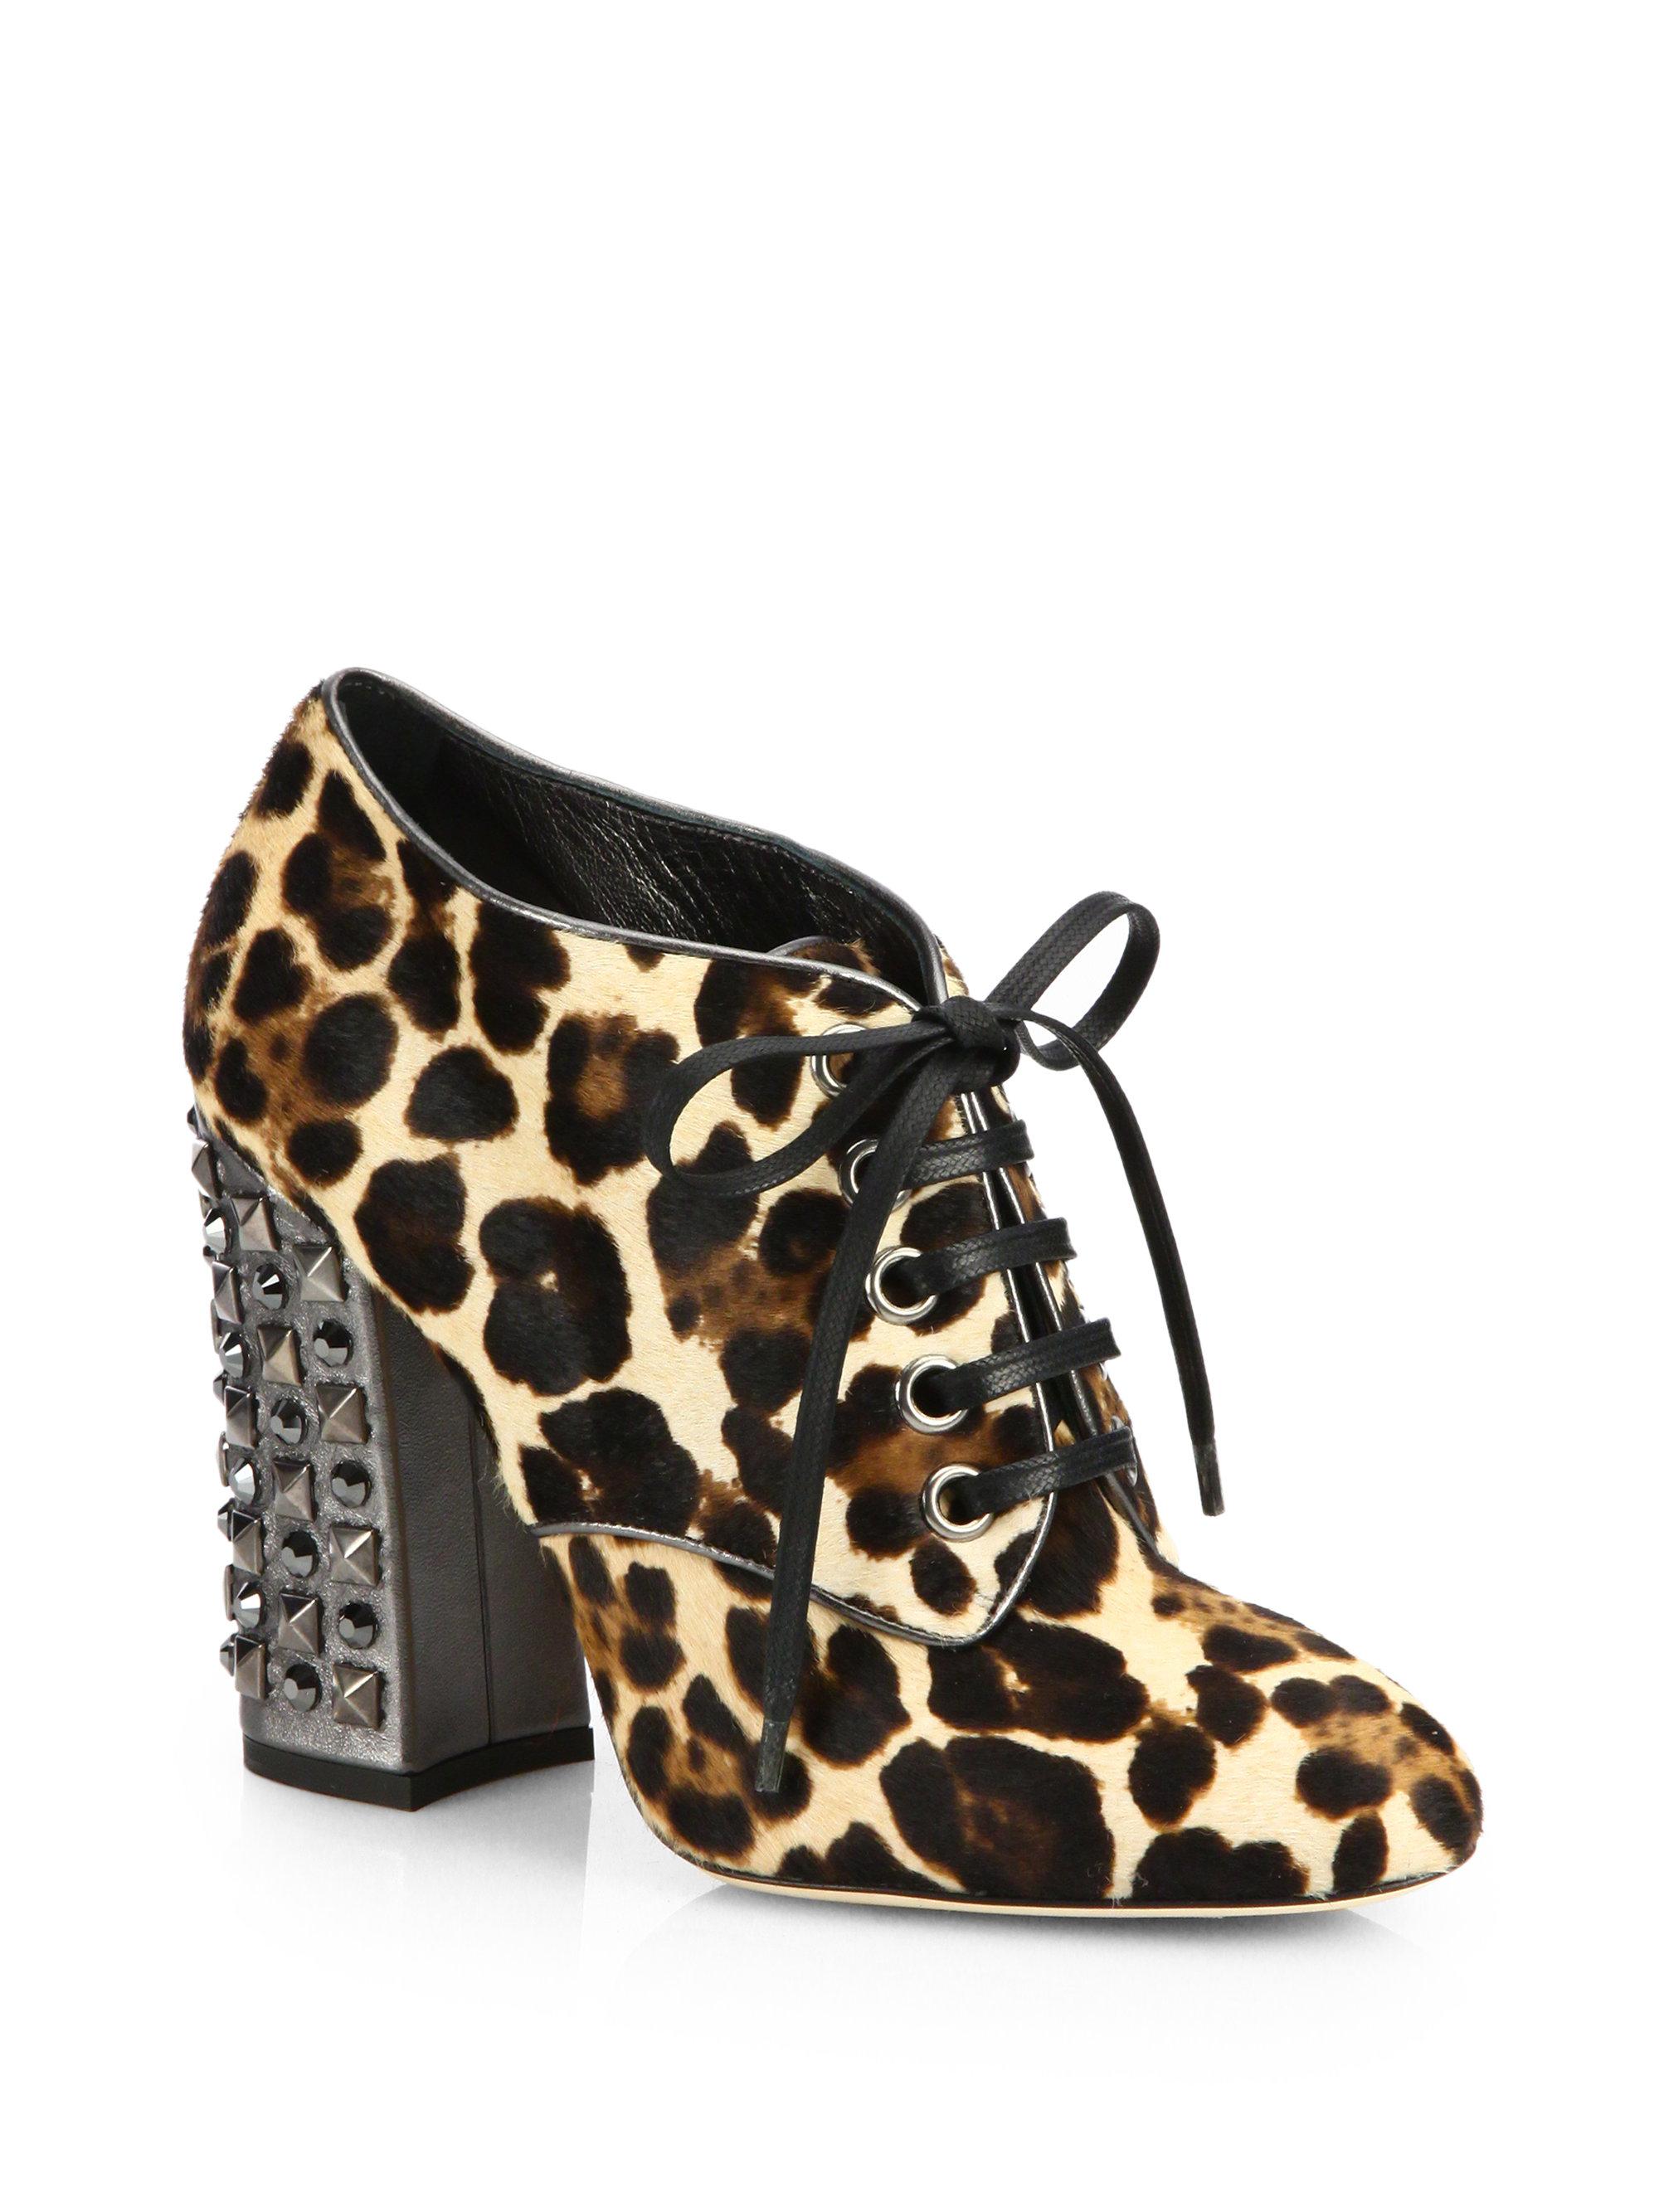 88f273c071b Dolce & Gabbana Leopard-Print Calf Hair Booties - Lyst